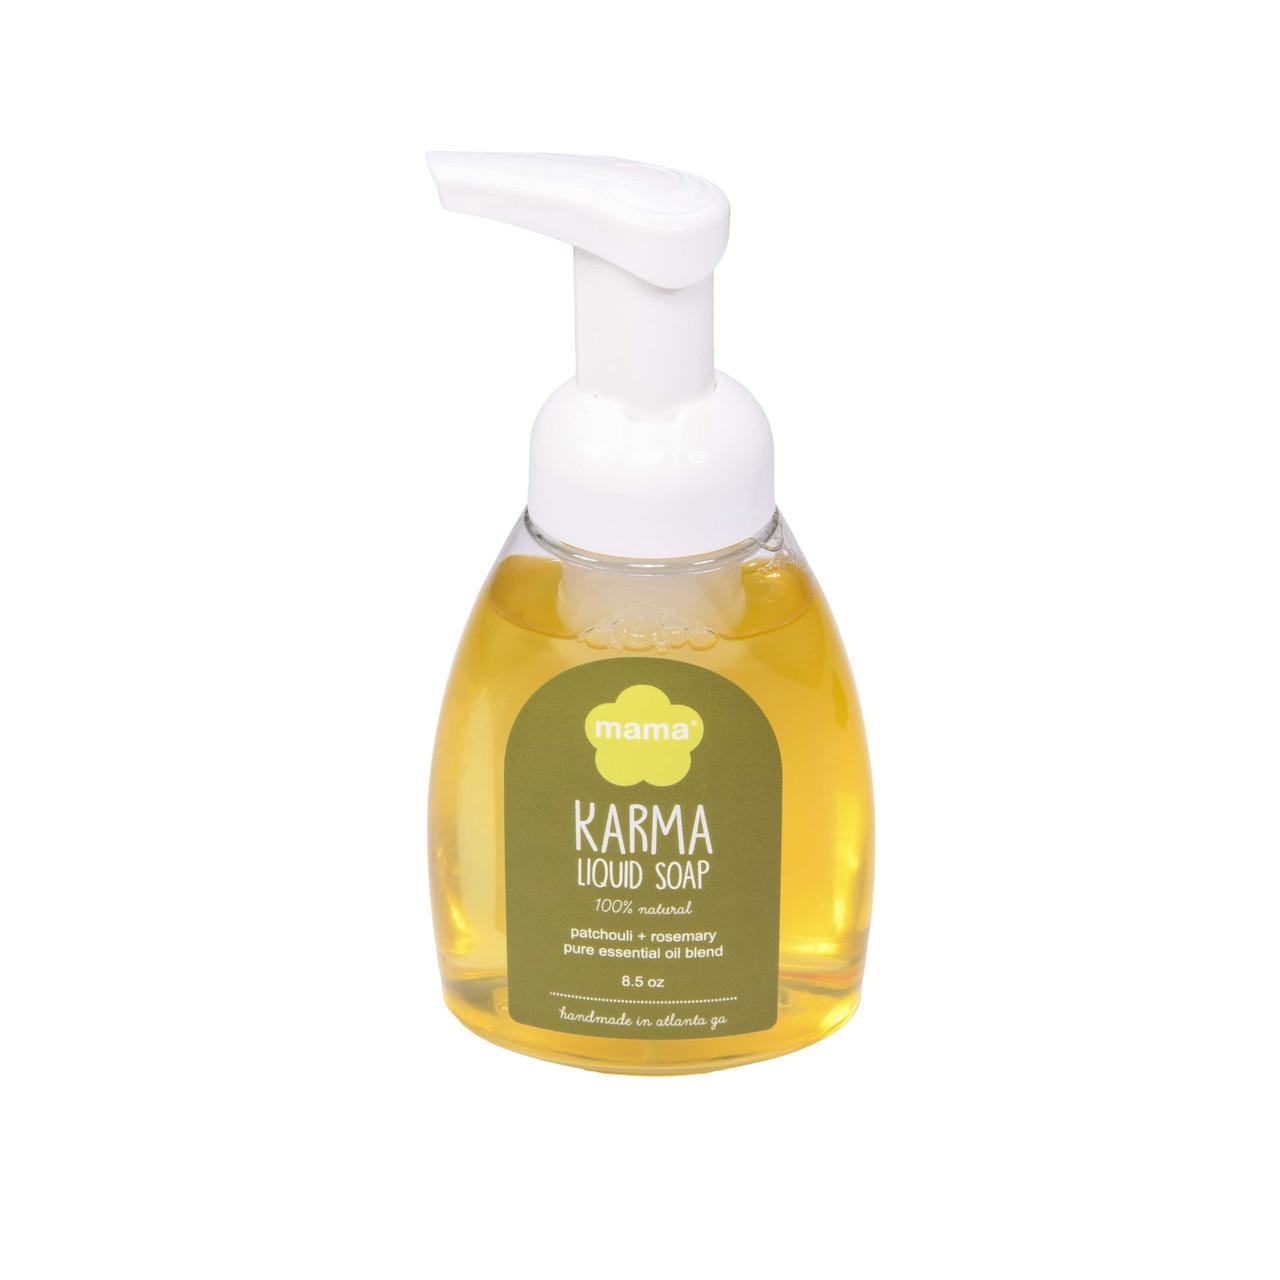 Karma (Patchouli + Rosemary) Liquid Soap | Mama Bath + Body